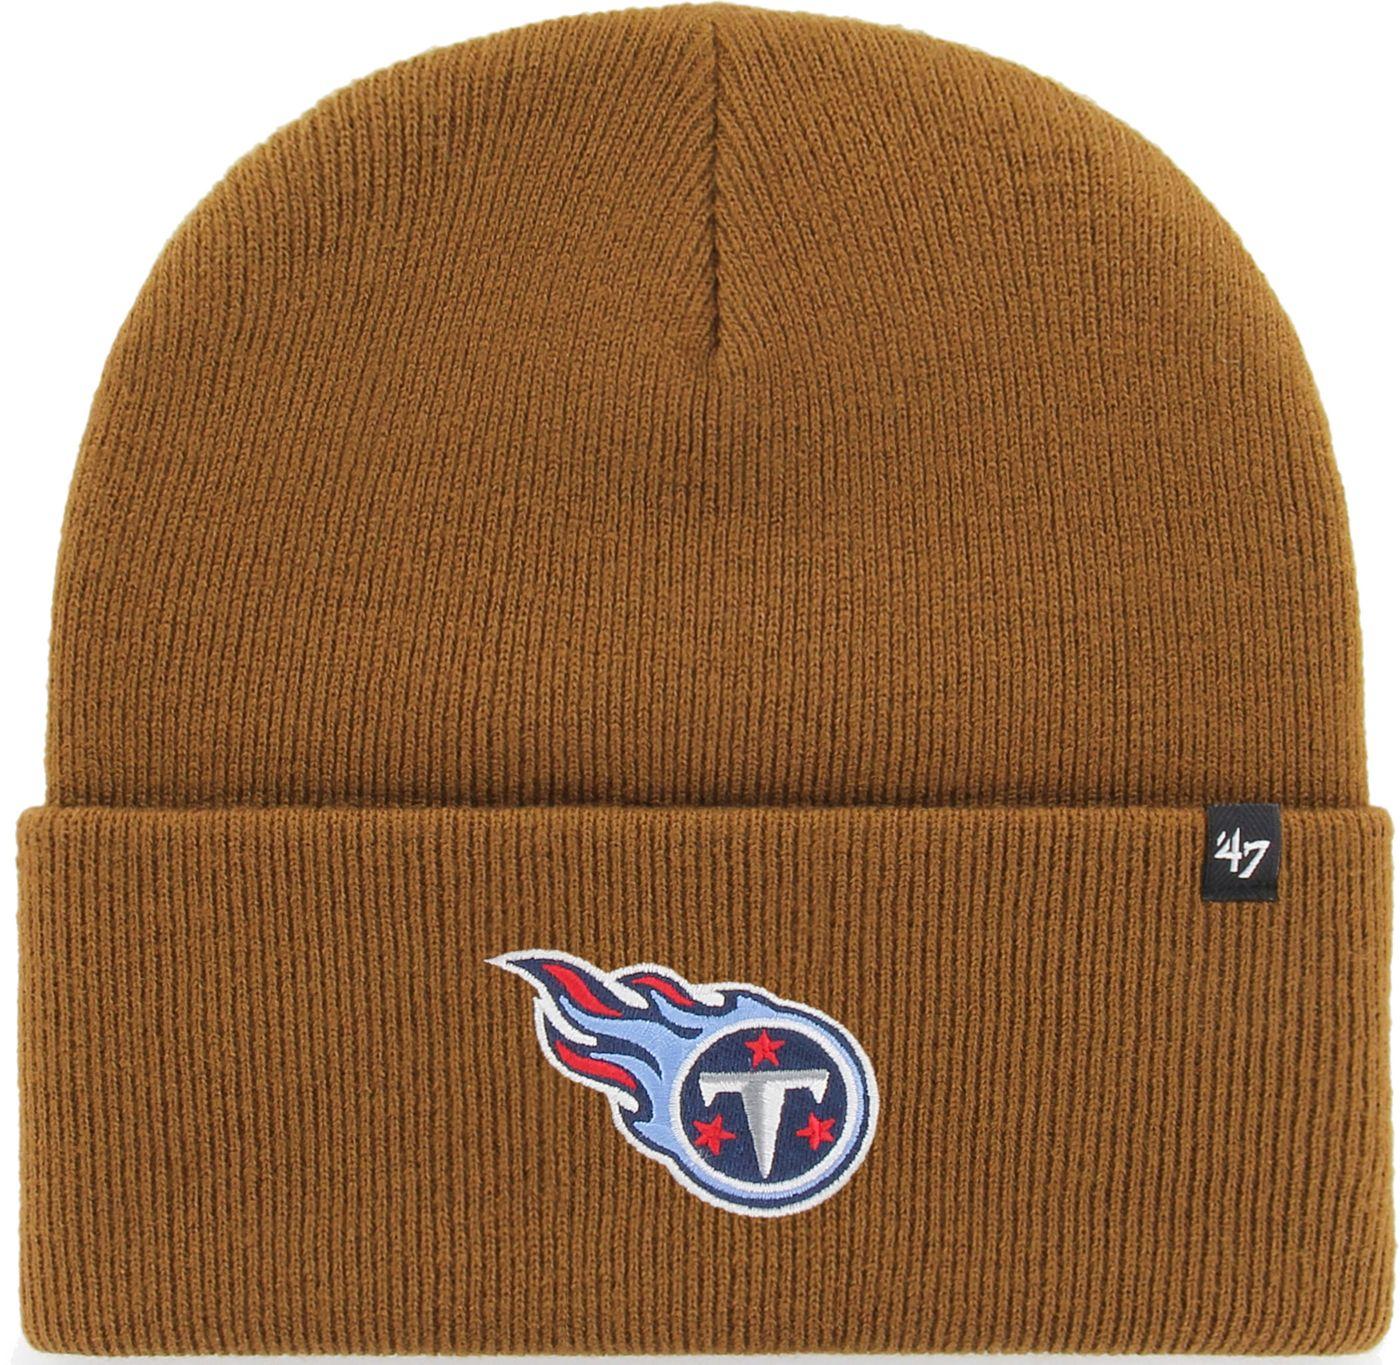 '47 Men's Tennessee Titans Carhartt Brown Knit Hat